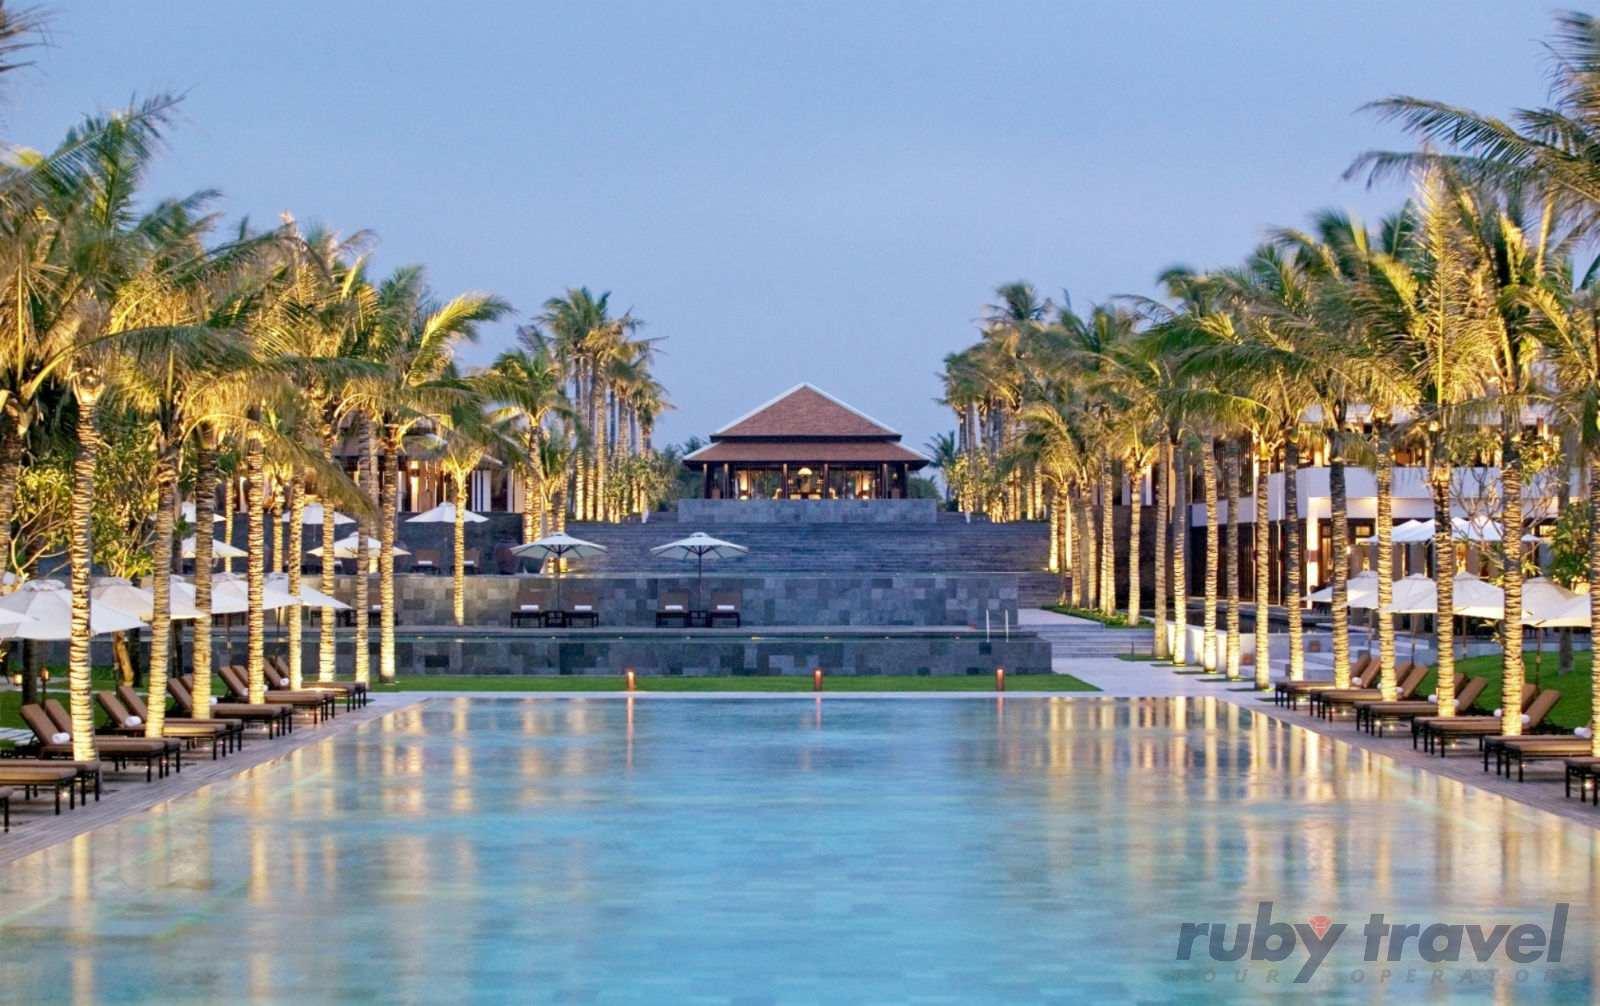 vietnam beach hoi an ruby travel viaggi 100 tailormade. Black Bedroom Furniture Sets. Home Design Ideas